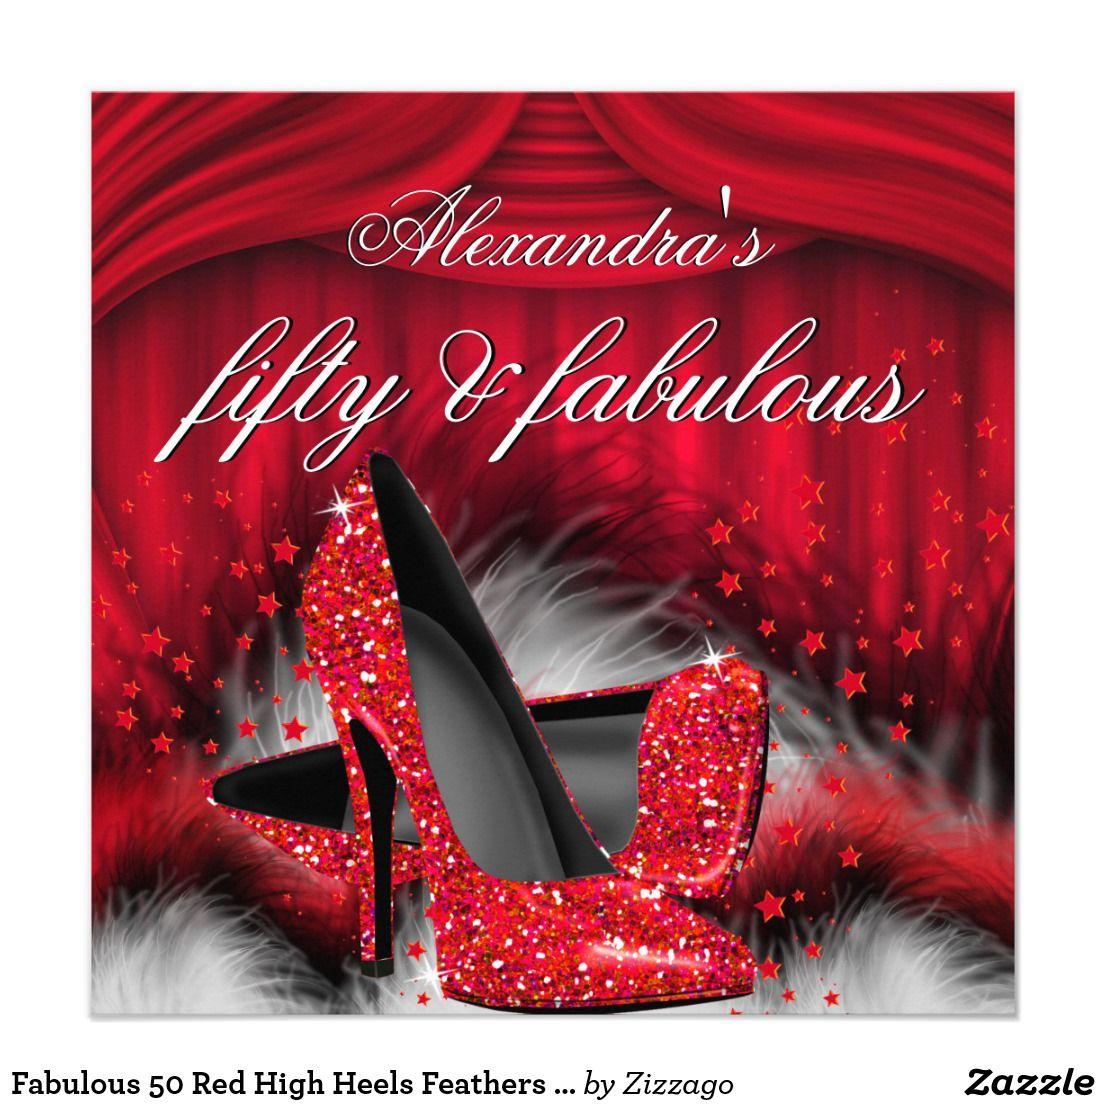 Fabulous 50 Red High Heels Feathers Birthday Invitation | Pinterest ...